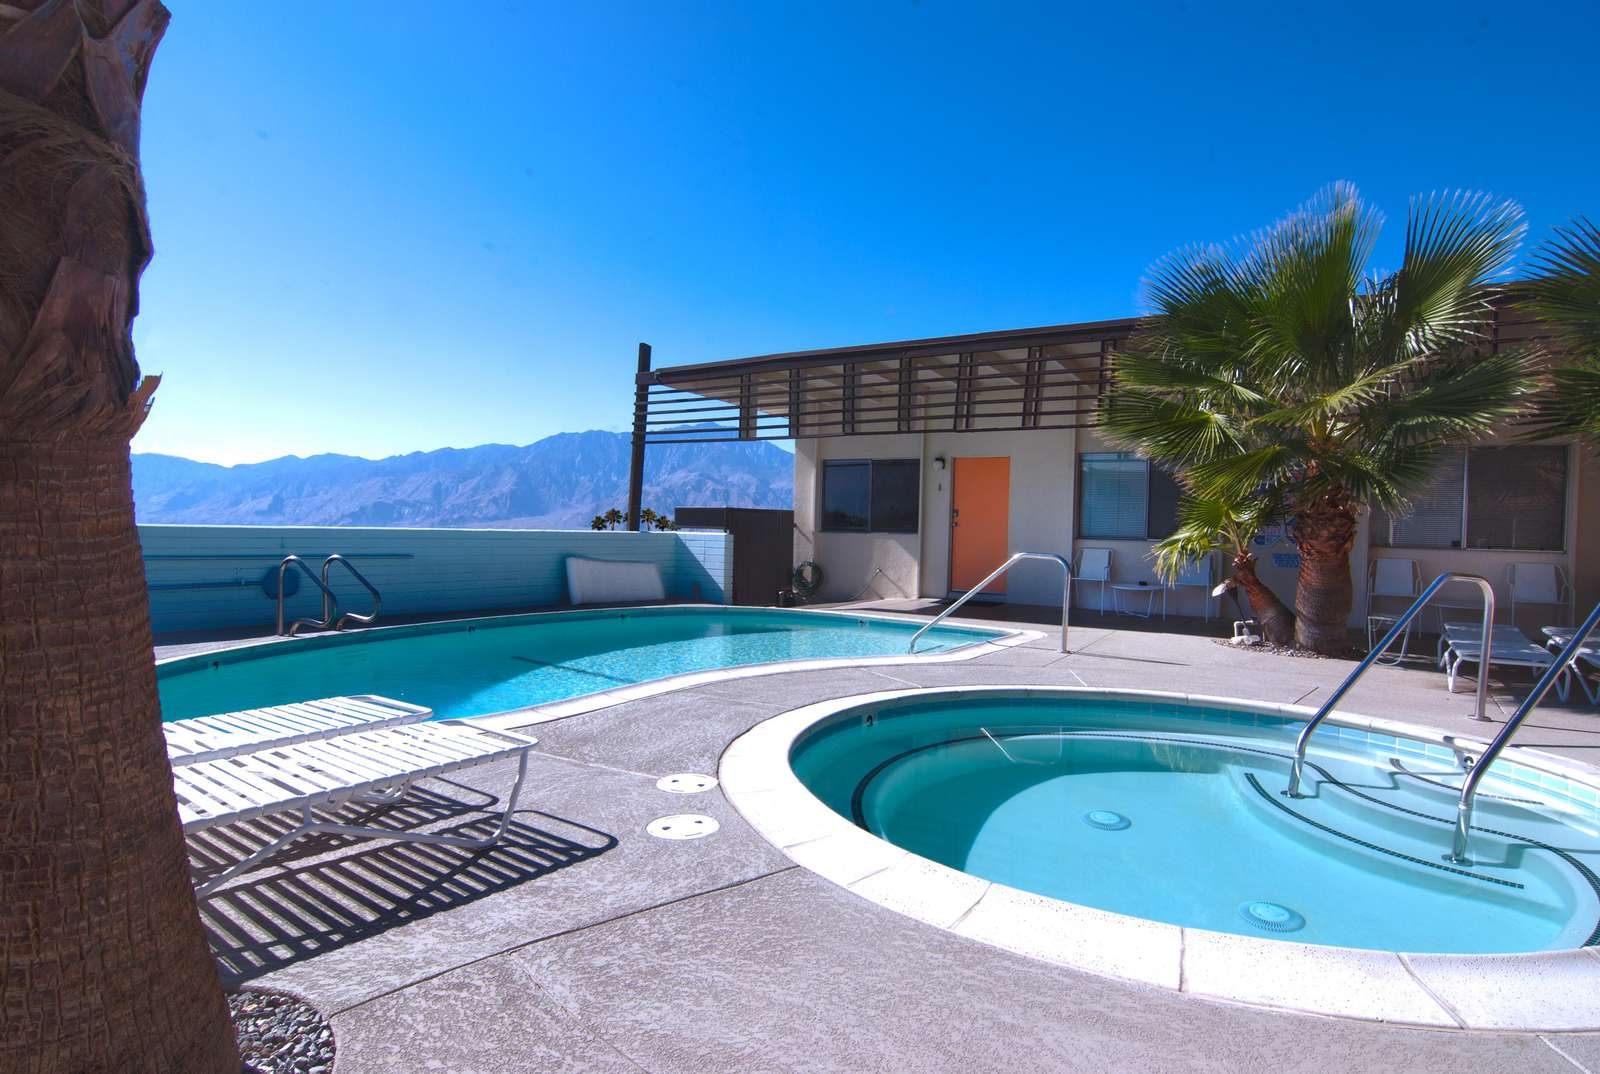 Pools deck, mountain view